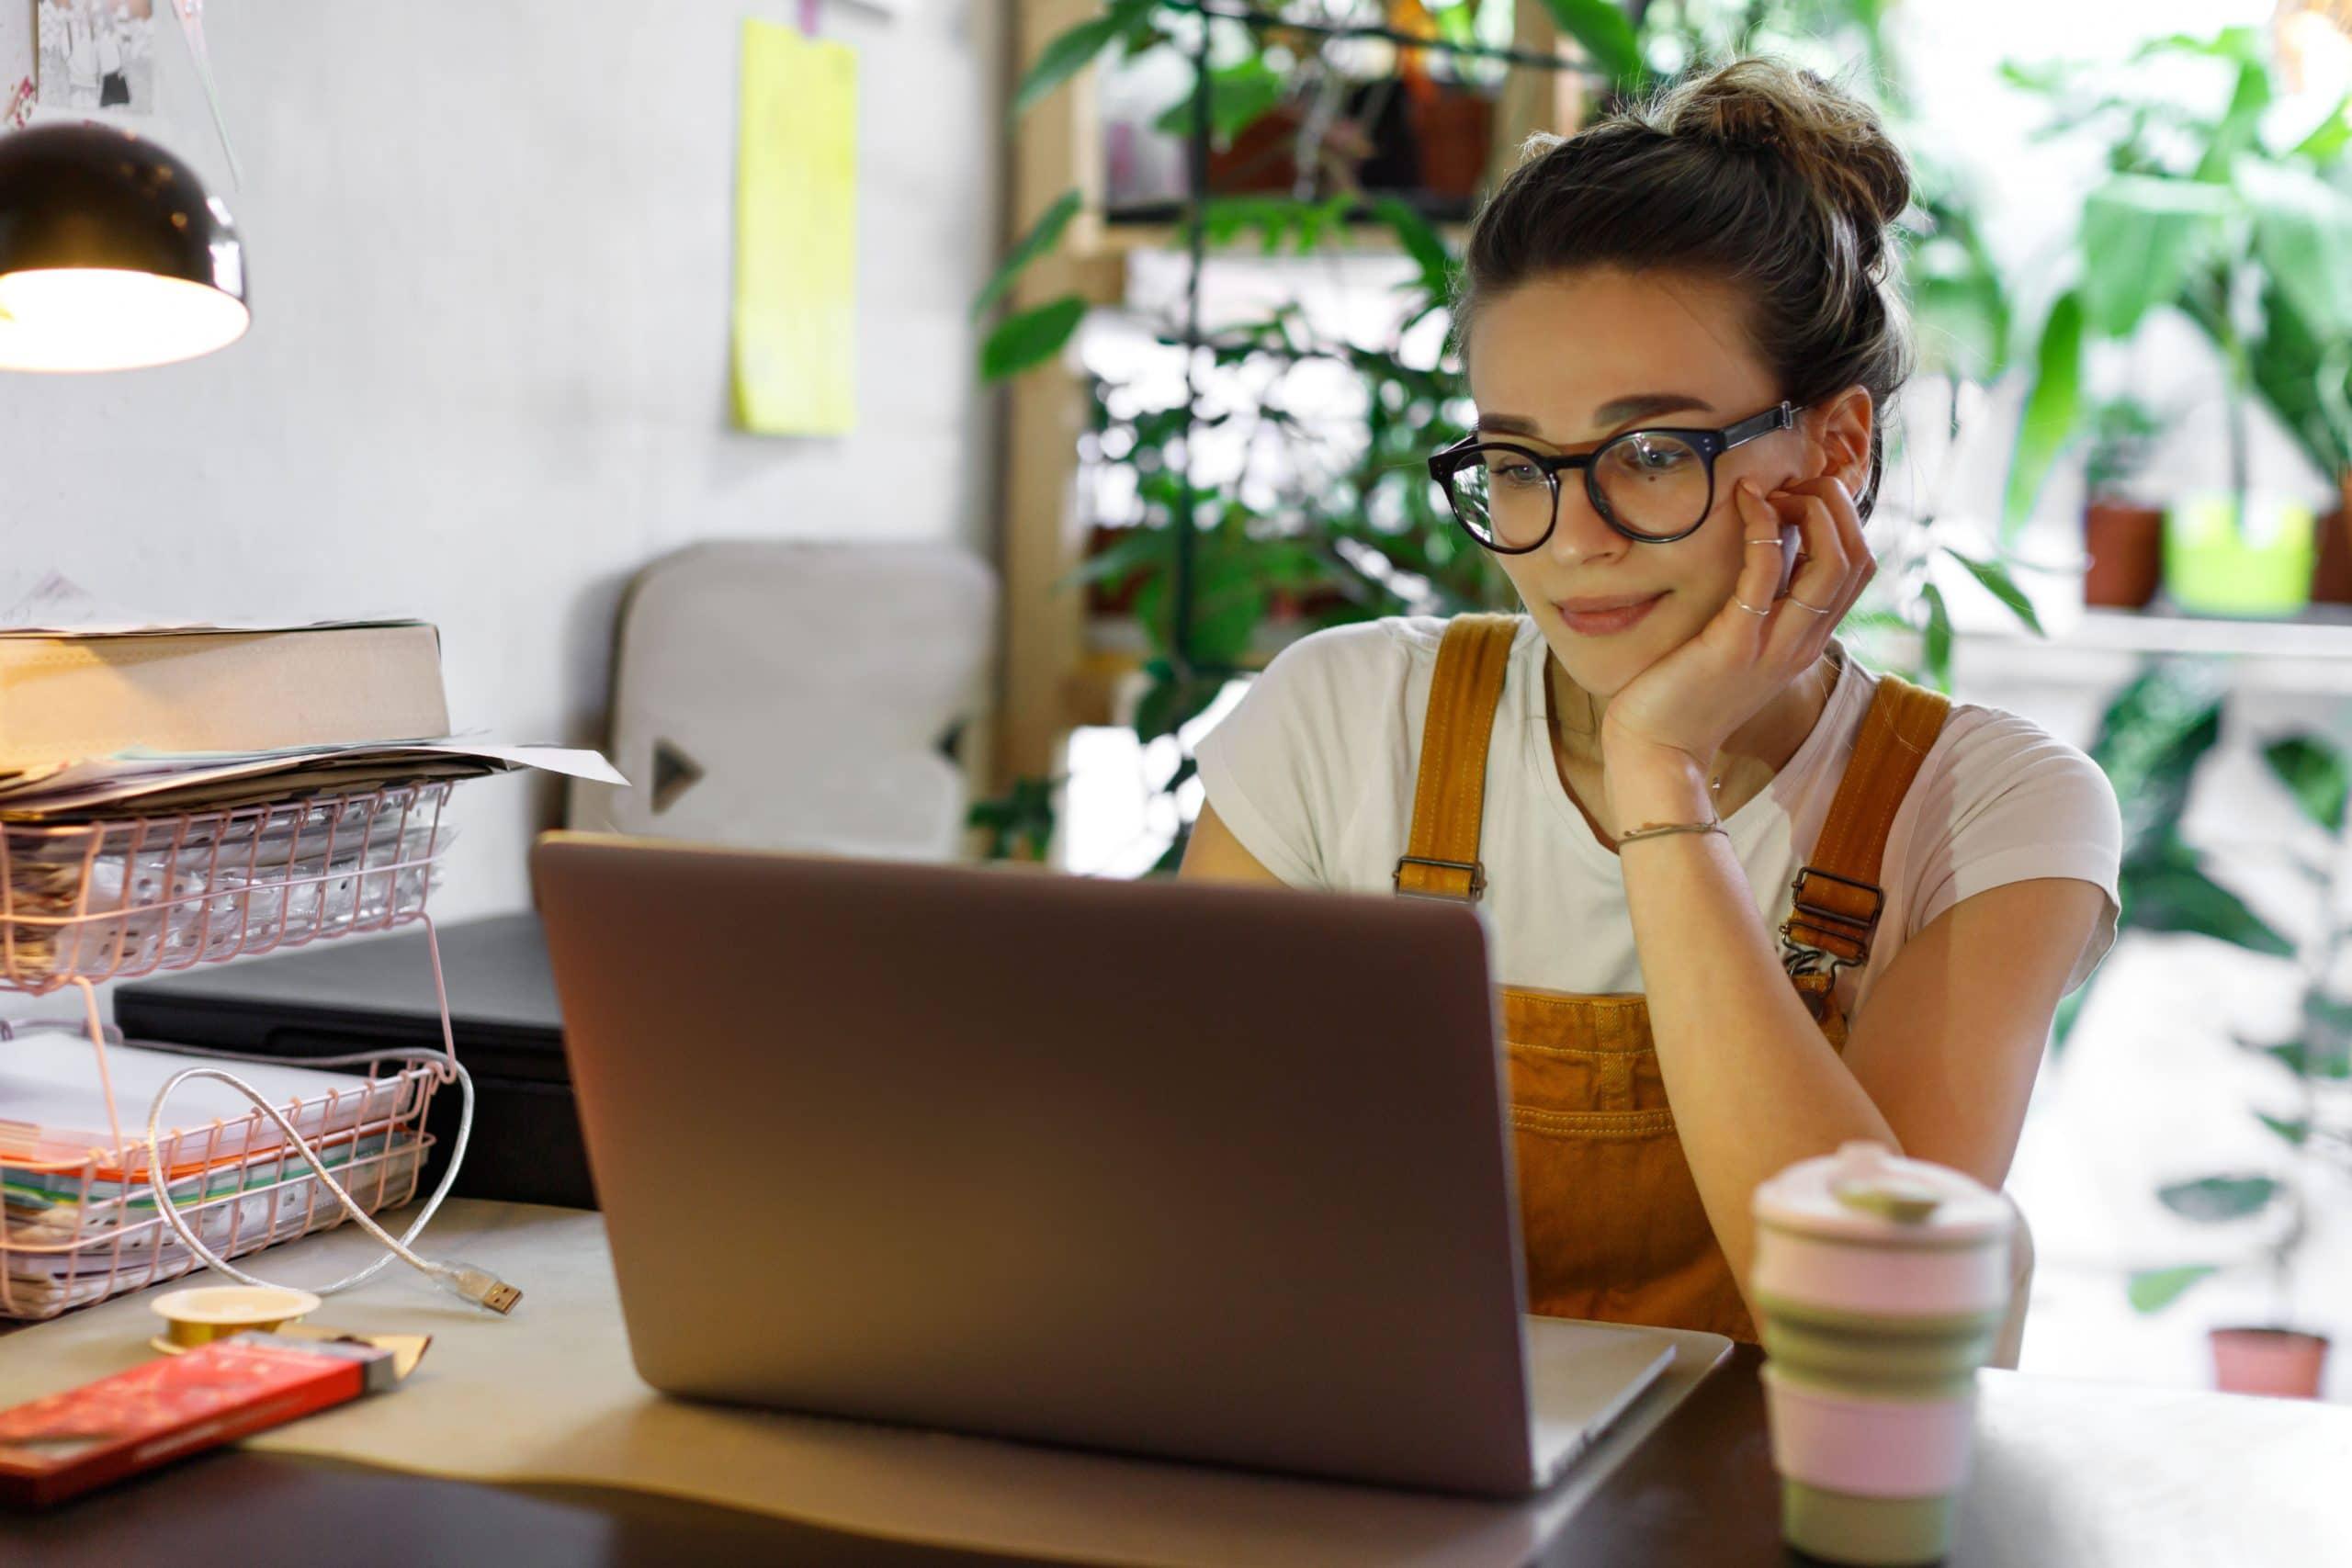 Young,Female,Gardener,In,Glasses,Using,Laptop,,Communicates,On,Internet